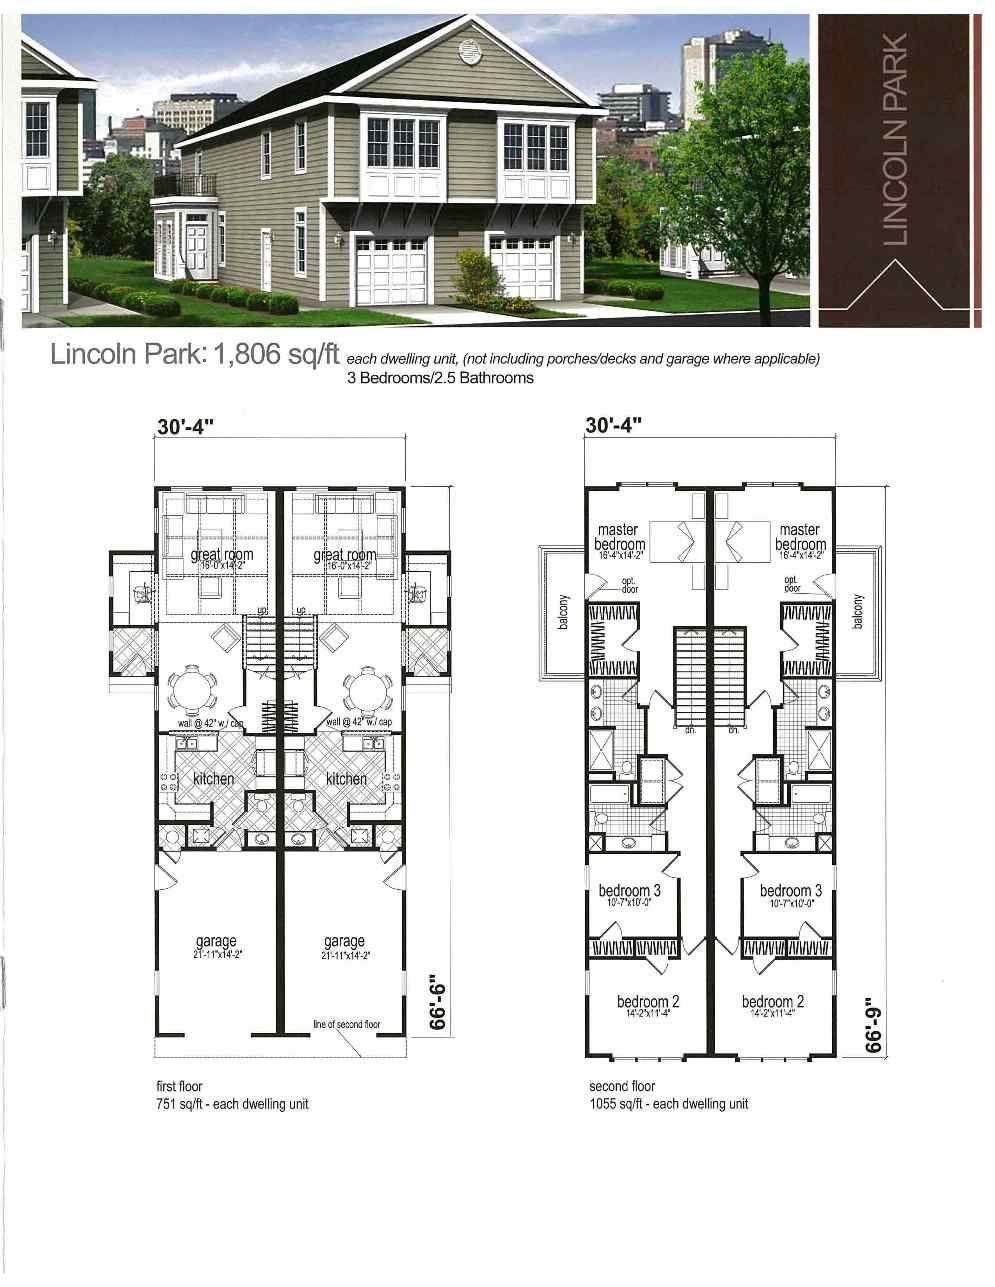 Duplex Plan Duplex House Plans Duplex Design Duplex House Design